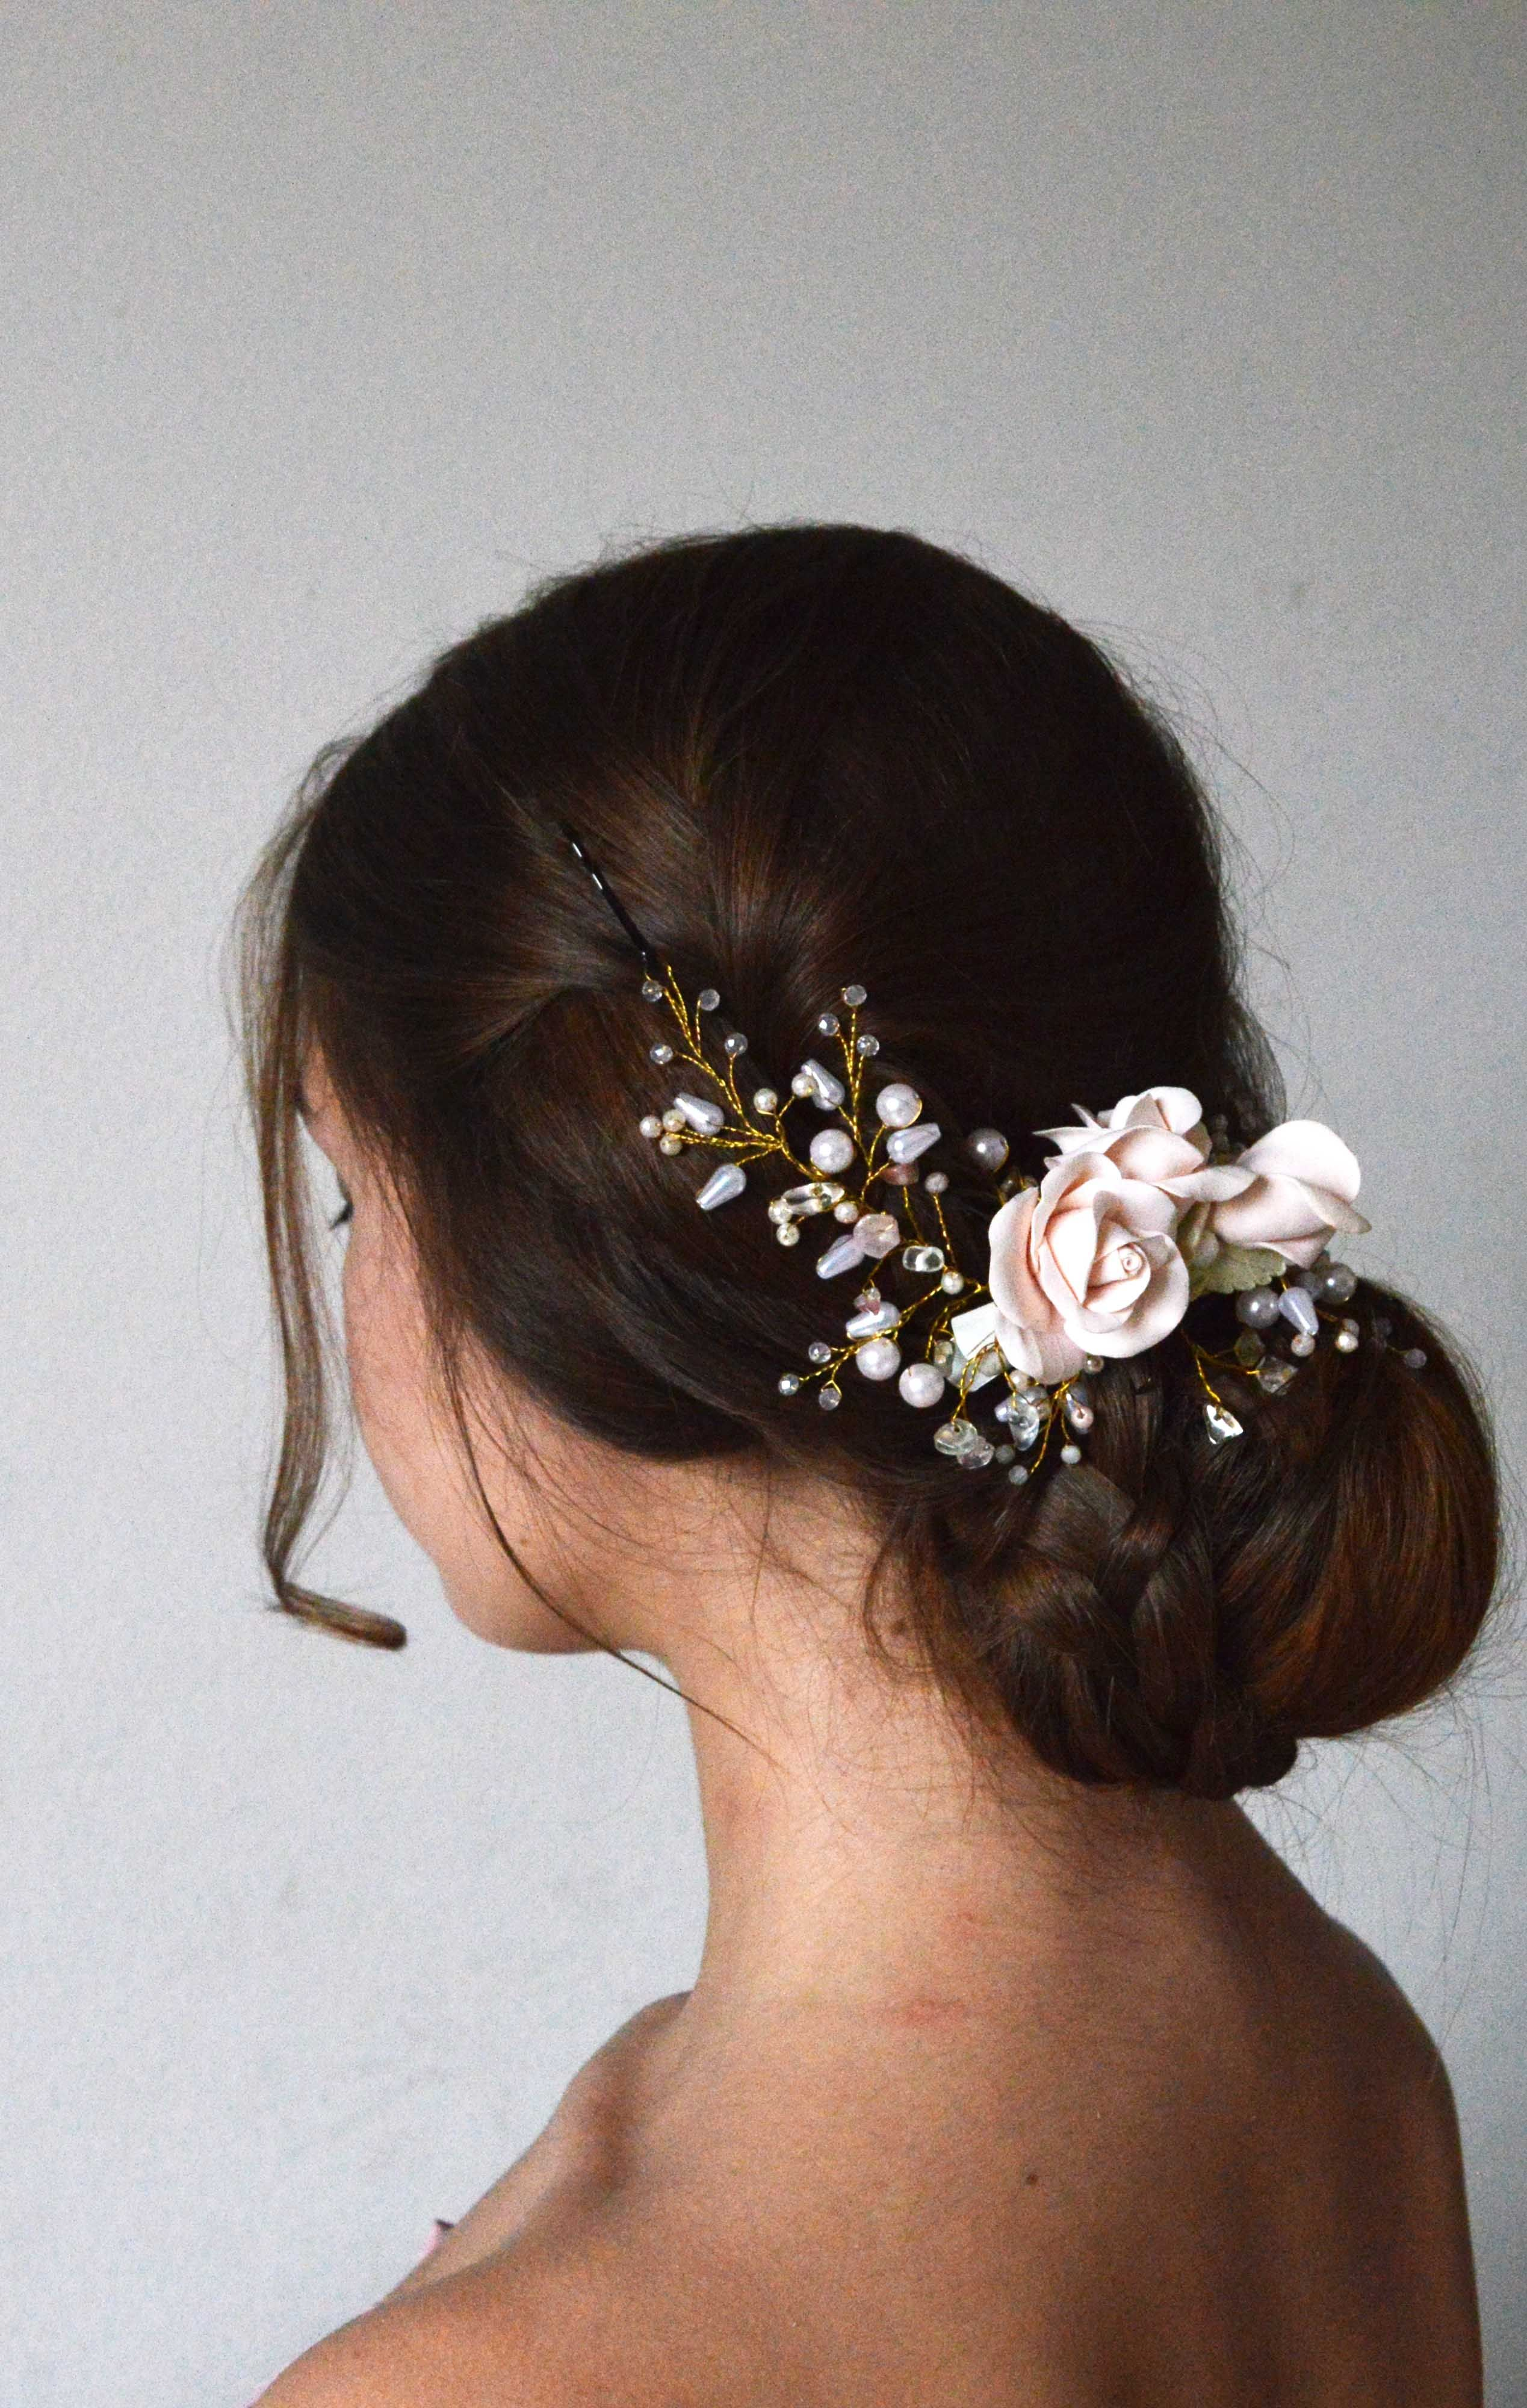 Bridal hair comb Wedding hair accessories White crystal flowers headpiece  Floral design hair pieces